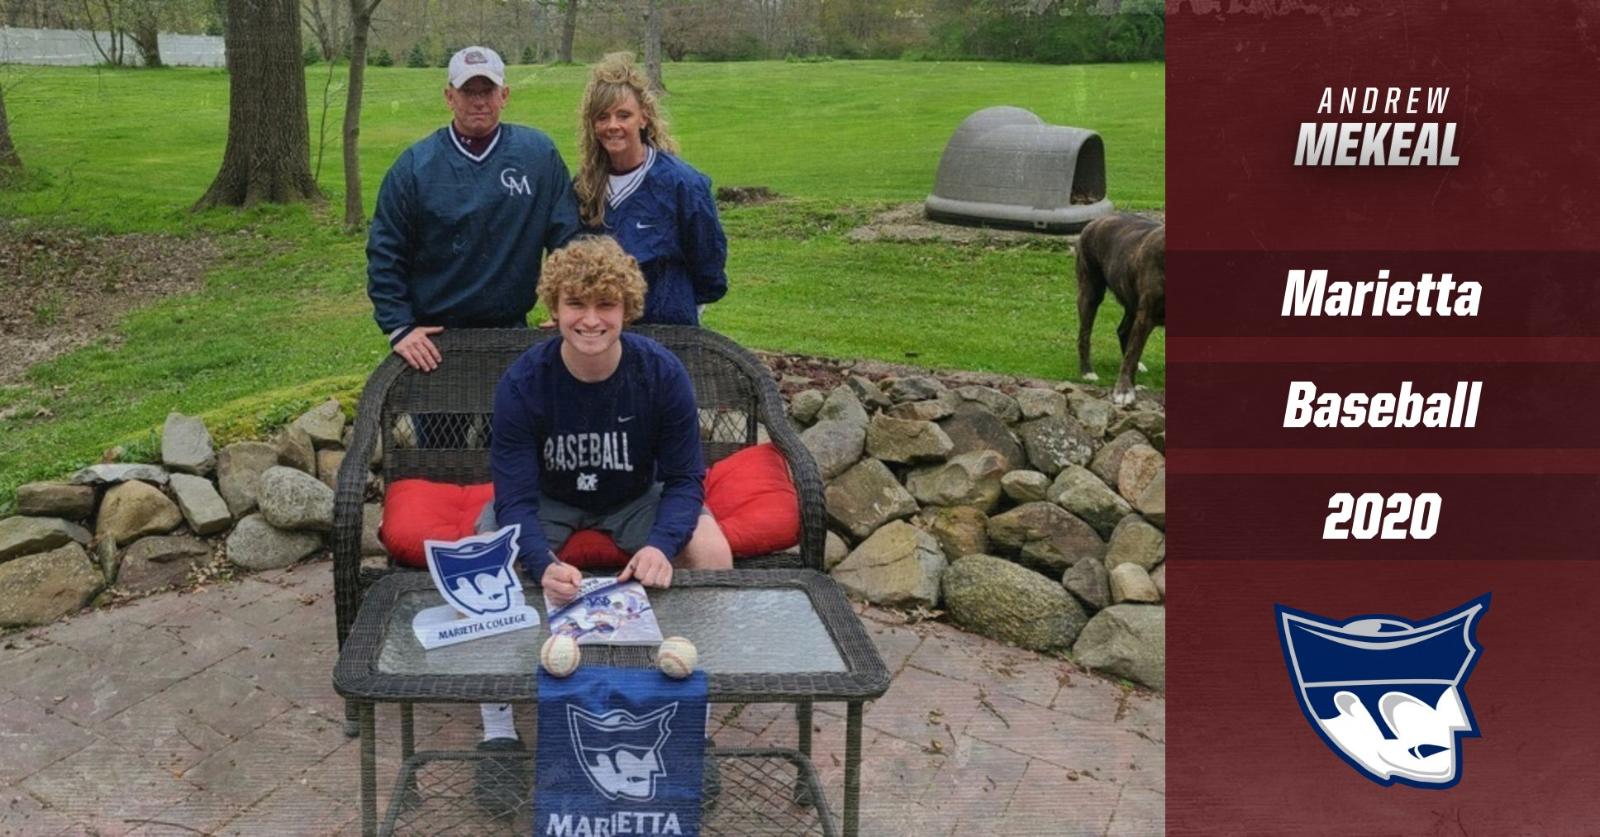 Andrew Mekeal Commits to Marietta College